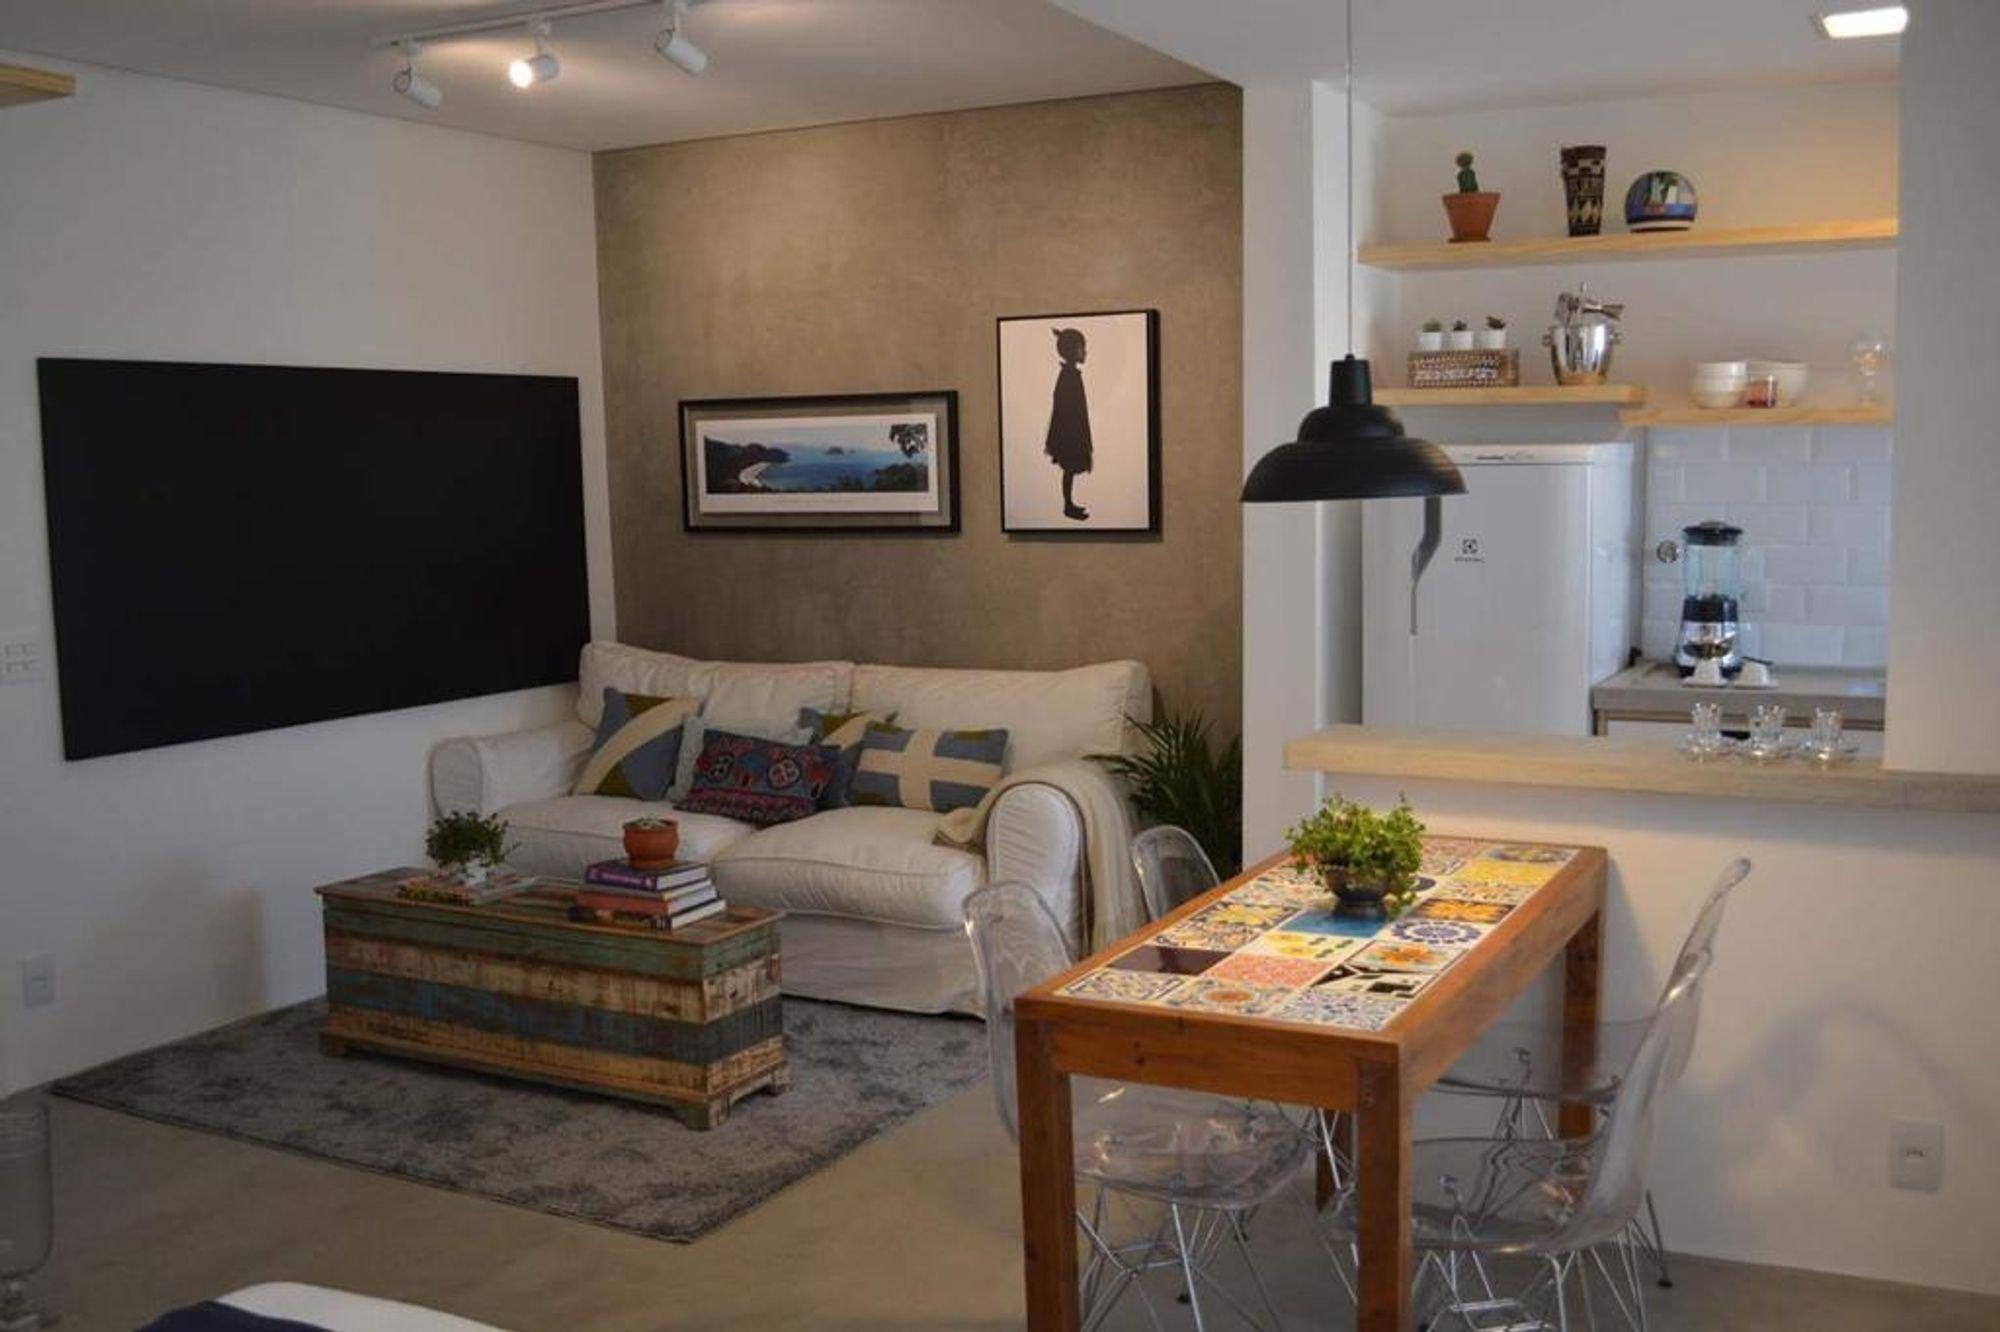 Foto de Sala com vaso de planta, sofá, vaso, cadeira, livro, mesa de jantar